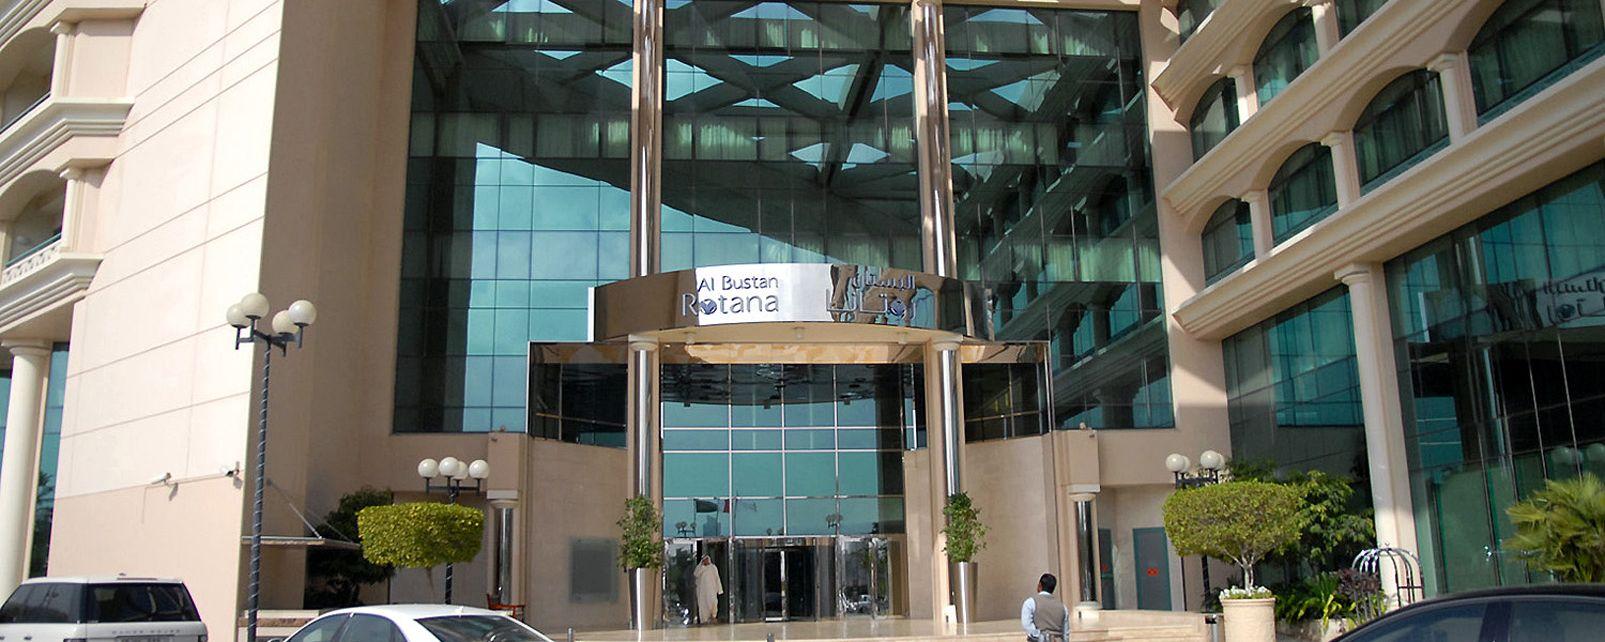 Hôtel Al Bustan Rotana